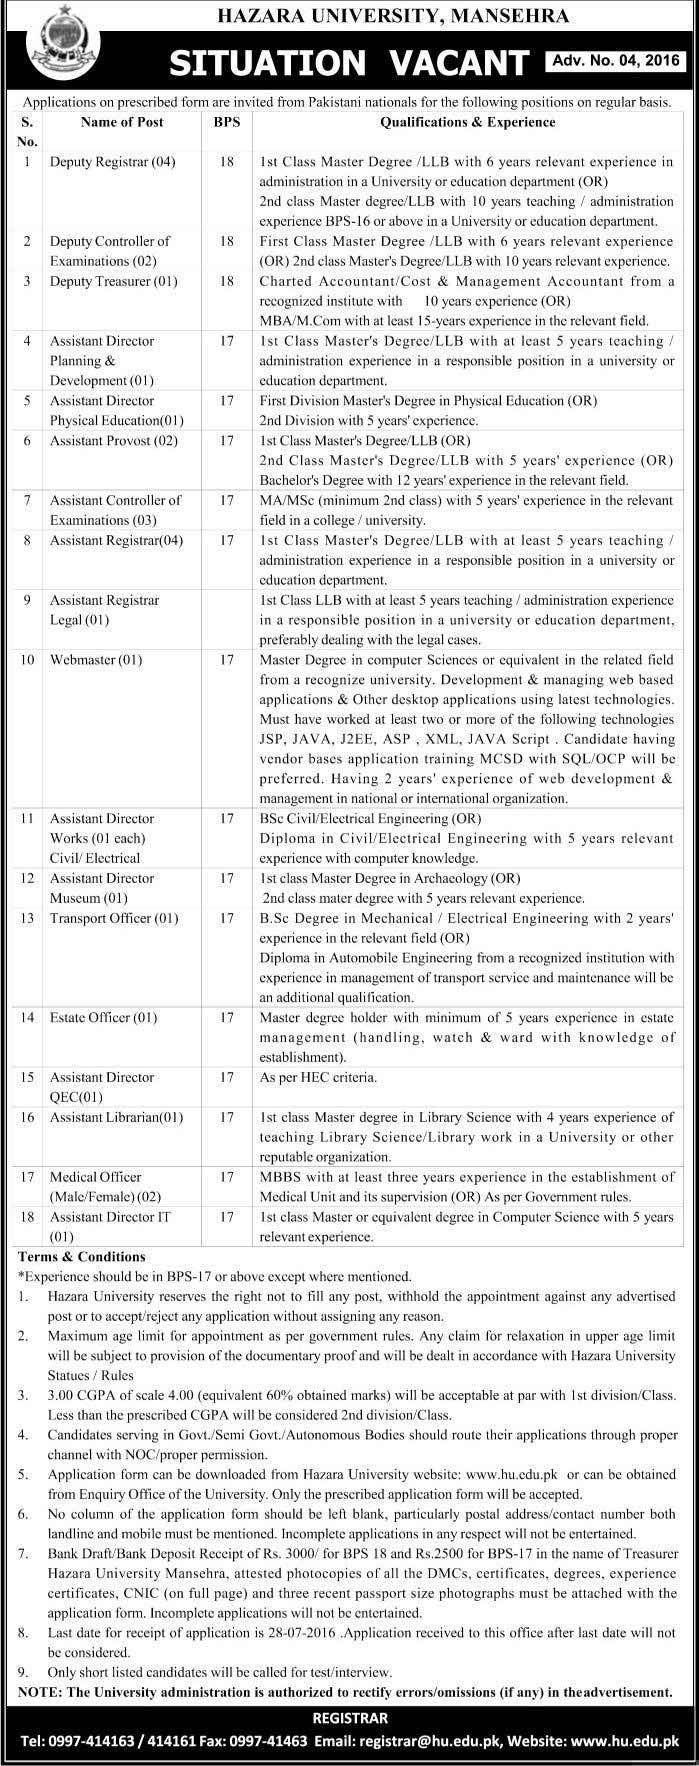 Hazara University Mansehra Jobs 2016